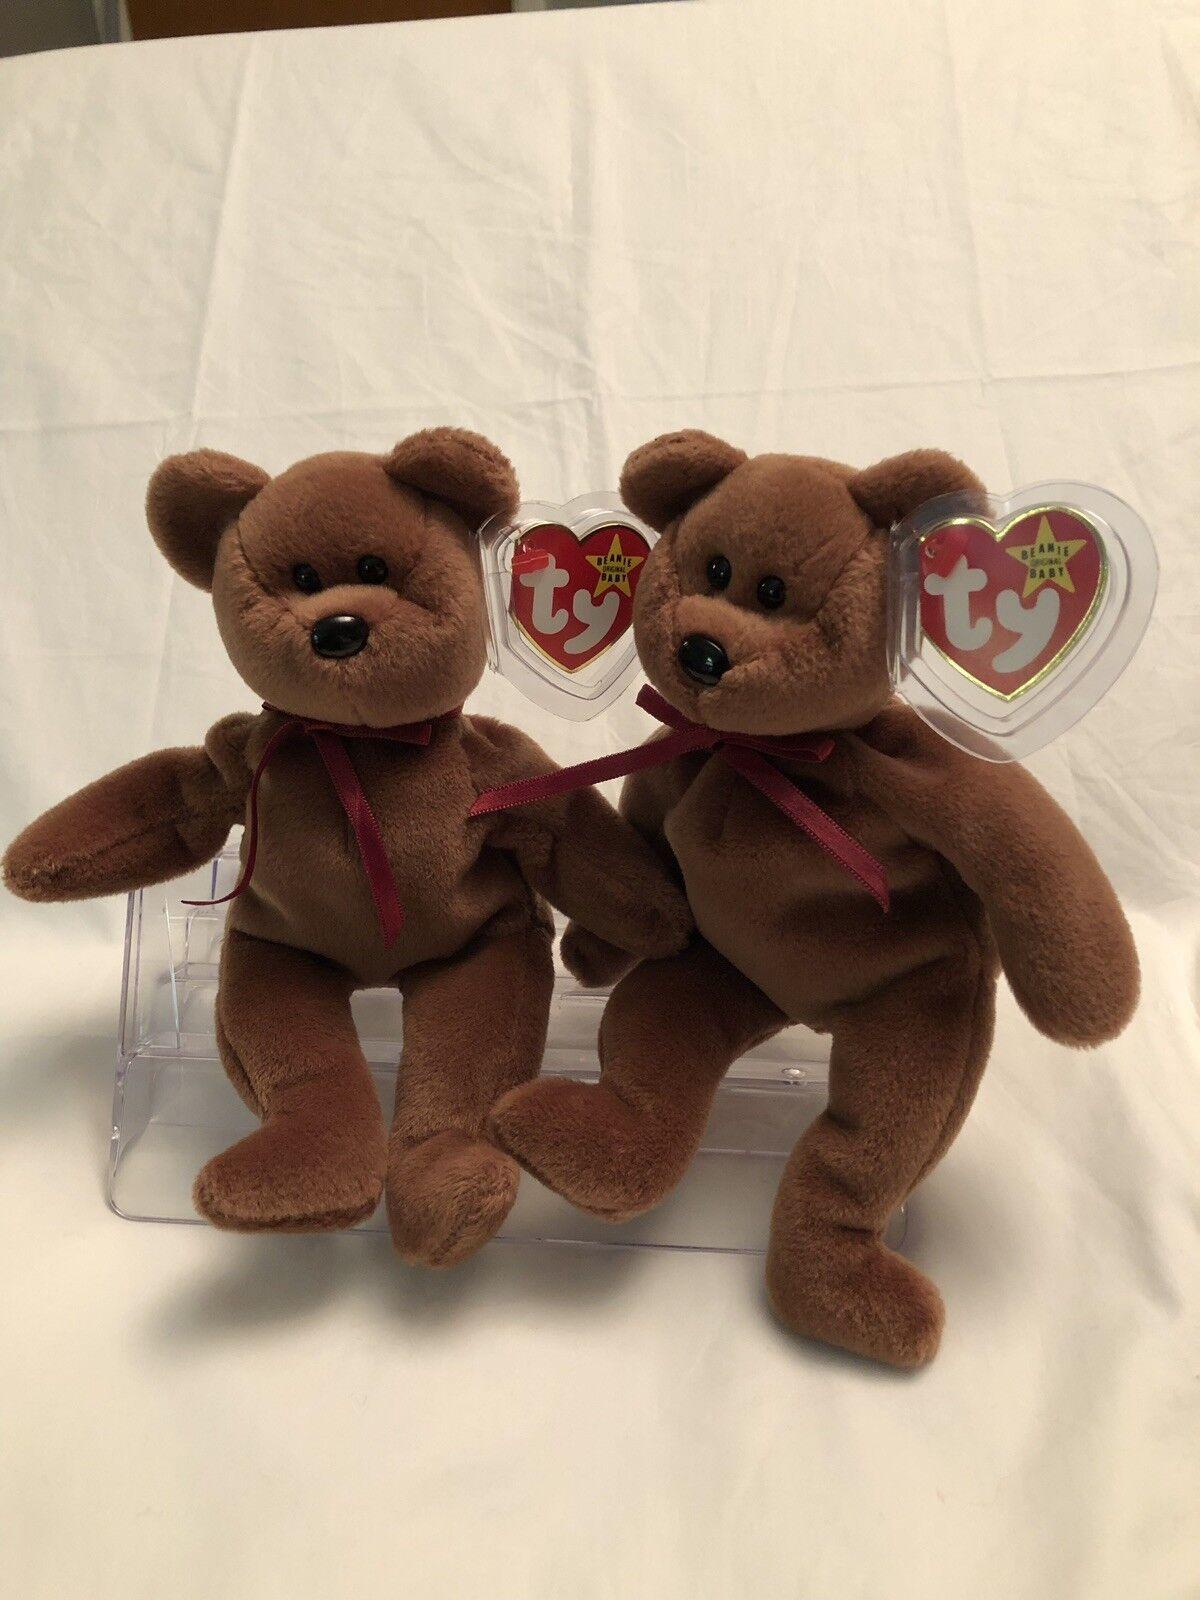 2 Ty Beanie Baby  TEDDY  The Bear Style 4050 - PVC TAG ERROR 1993 1995 - RETIRED